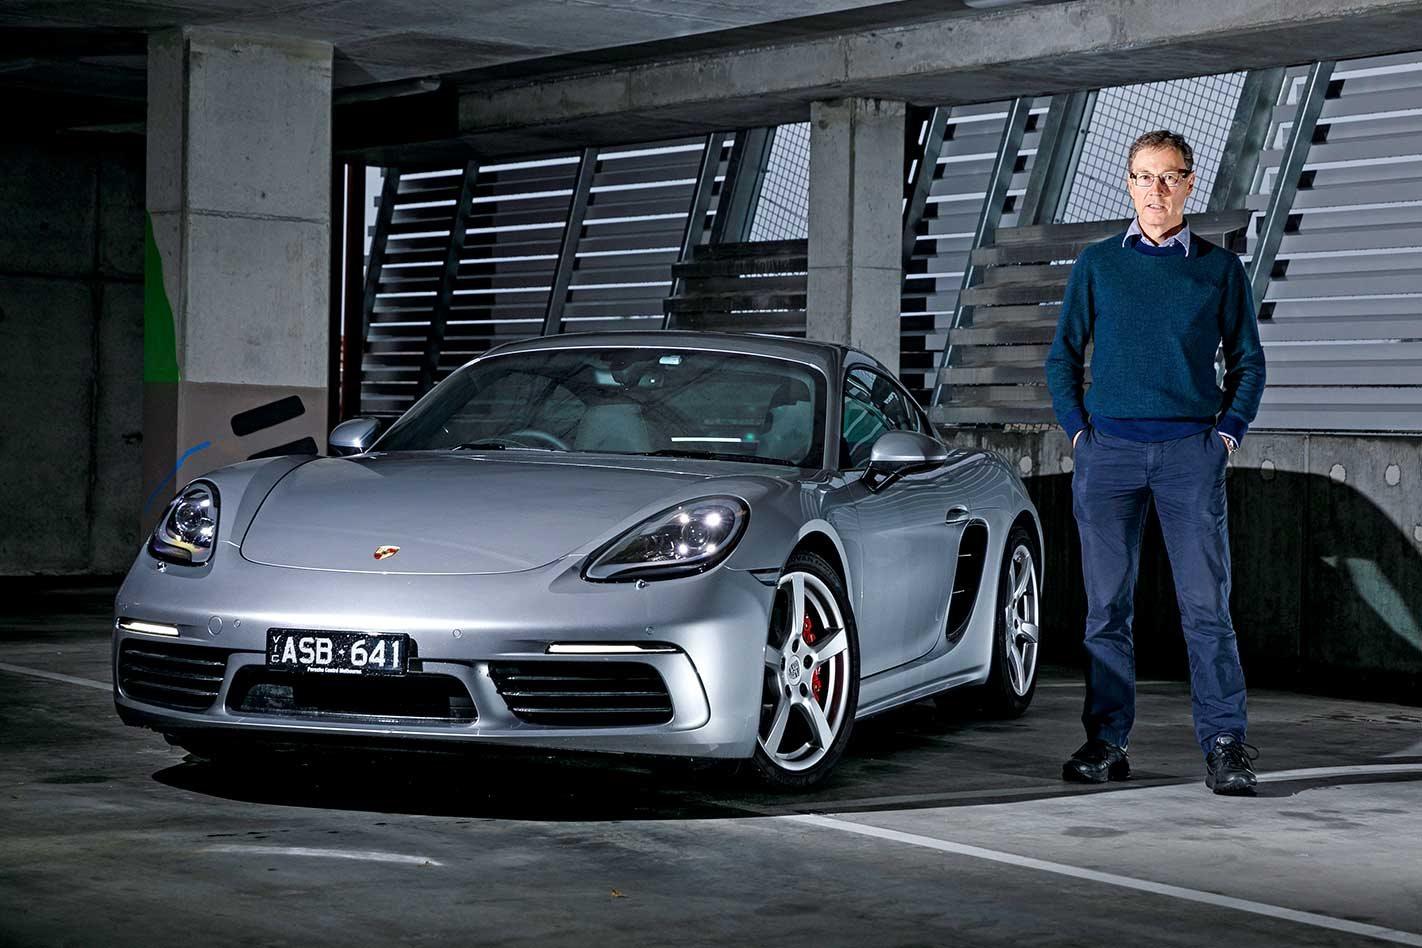 2018 Porsche 718 Cayman S: MOTOR Reader's Rides